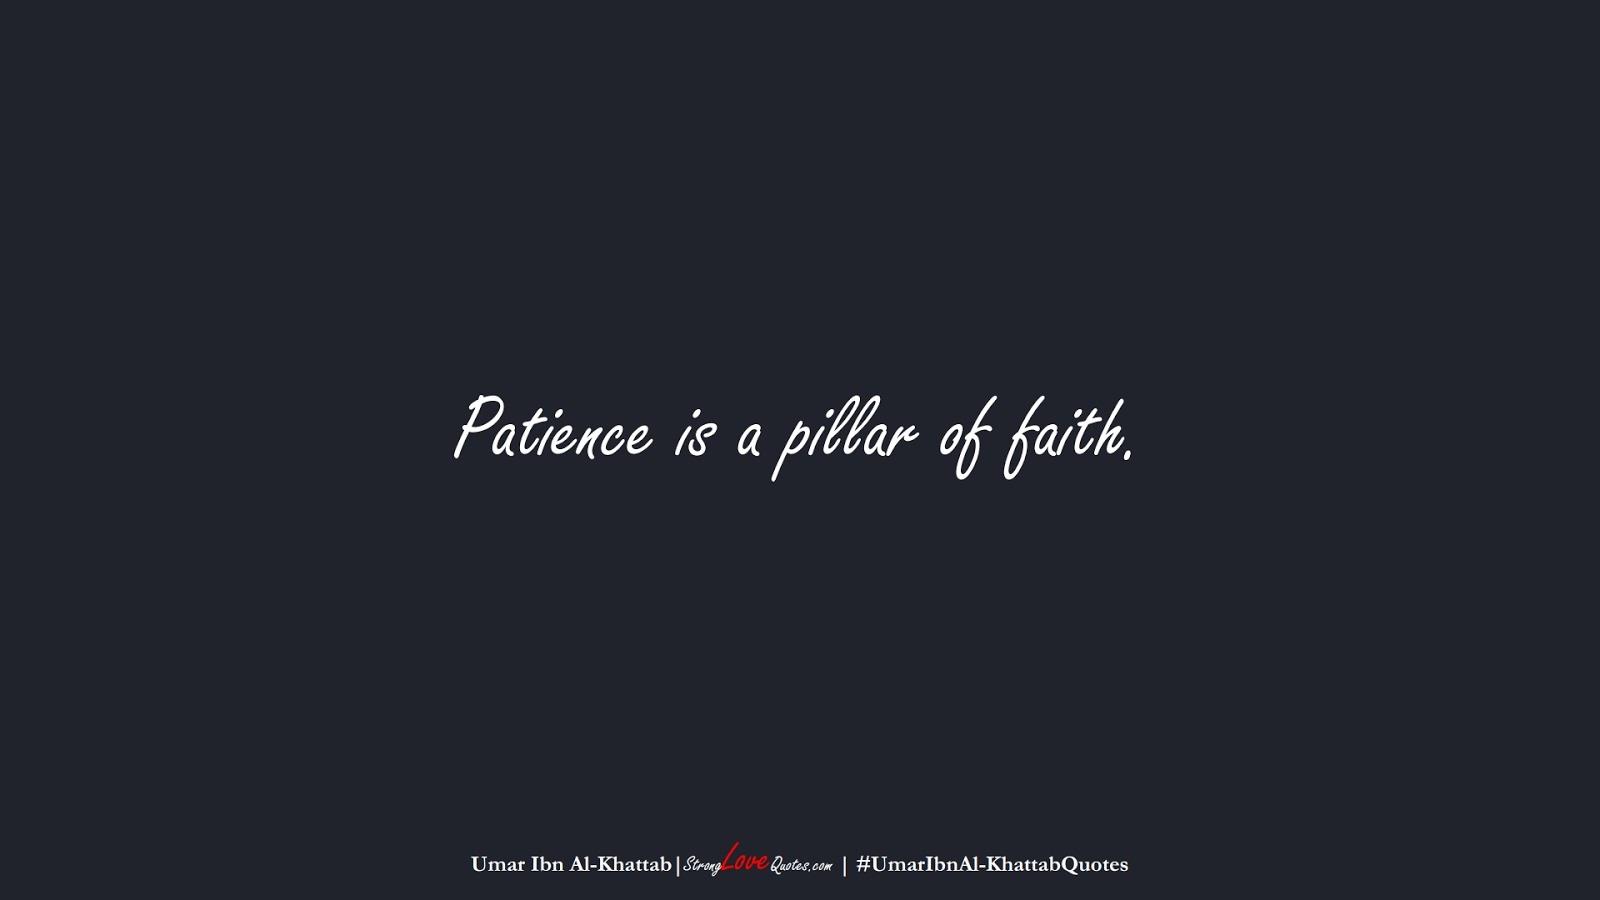 Patience is a pillar of faith. (Umar Ibn Al-Khattab);  #UmarIbnAl-KhattabQuotes